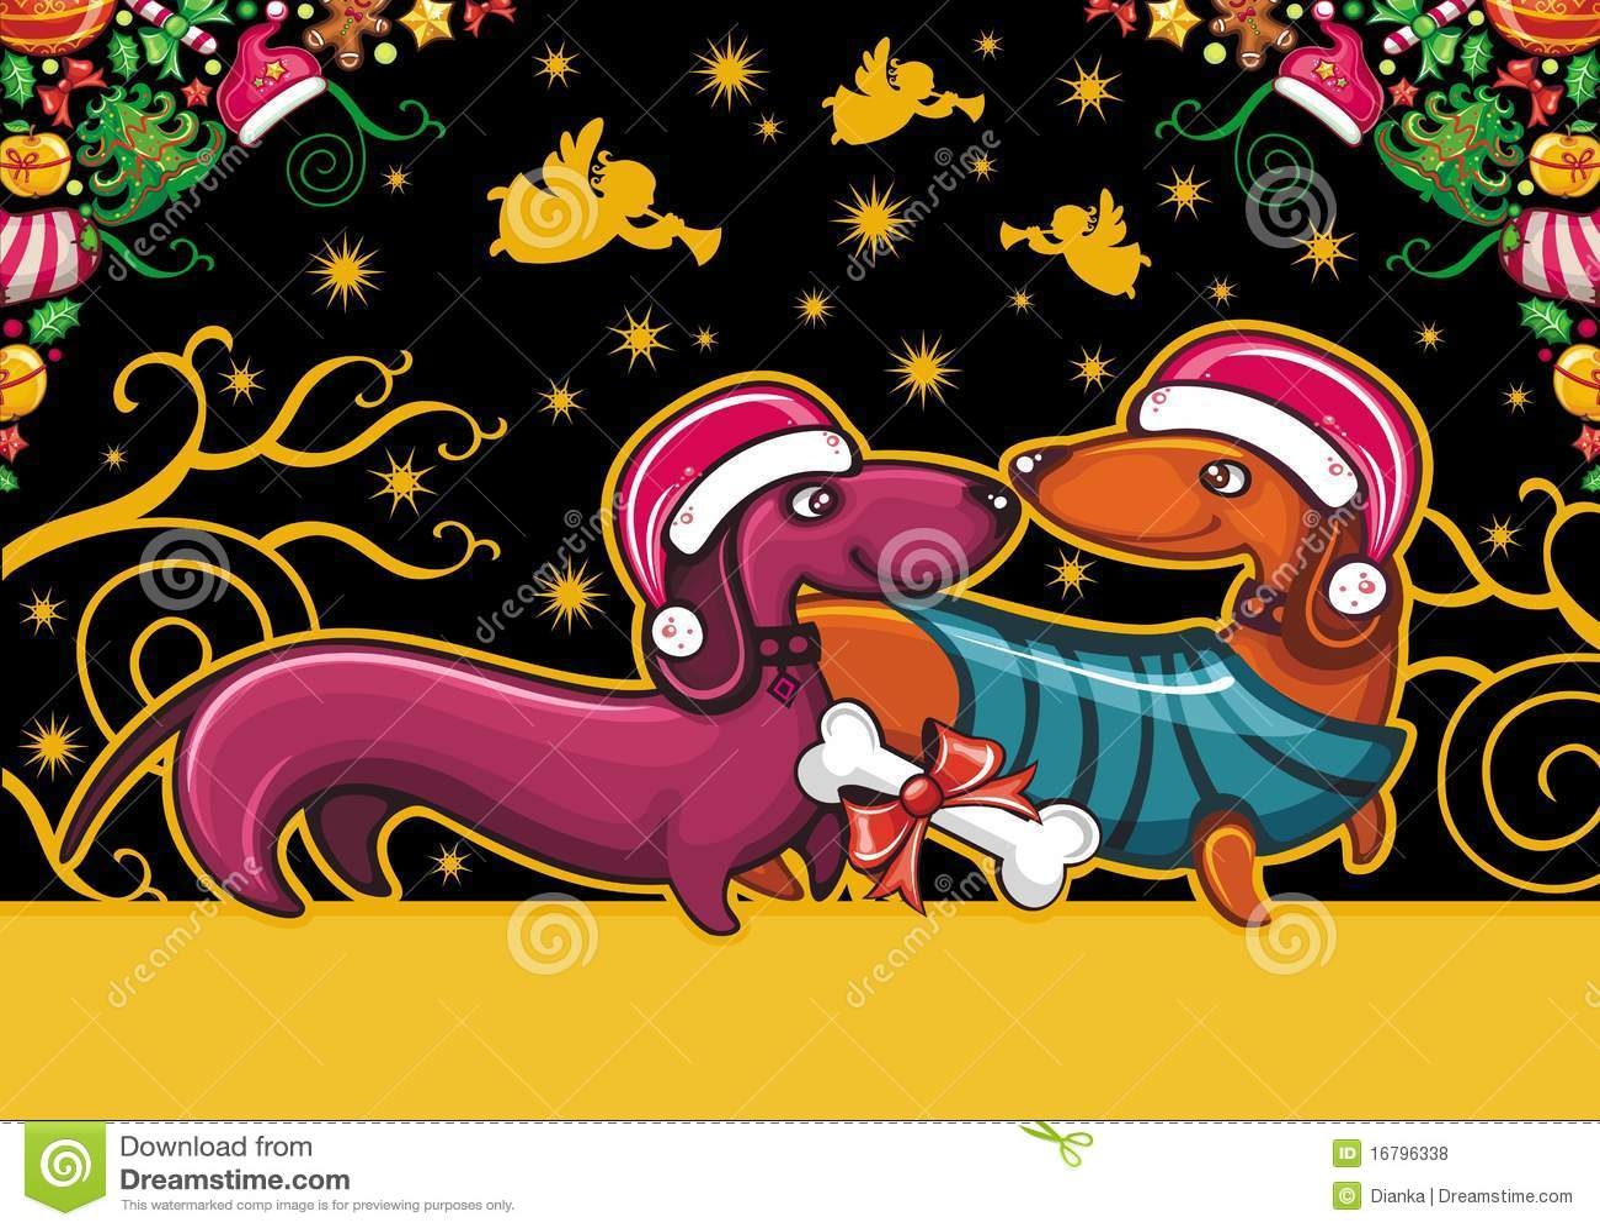 Christmas Dachshund Greeting Card Royalty Free Stock